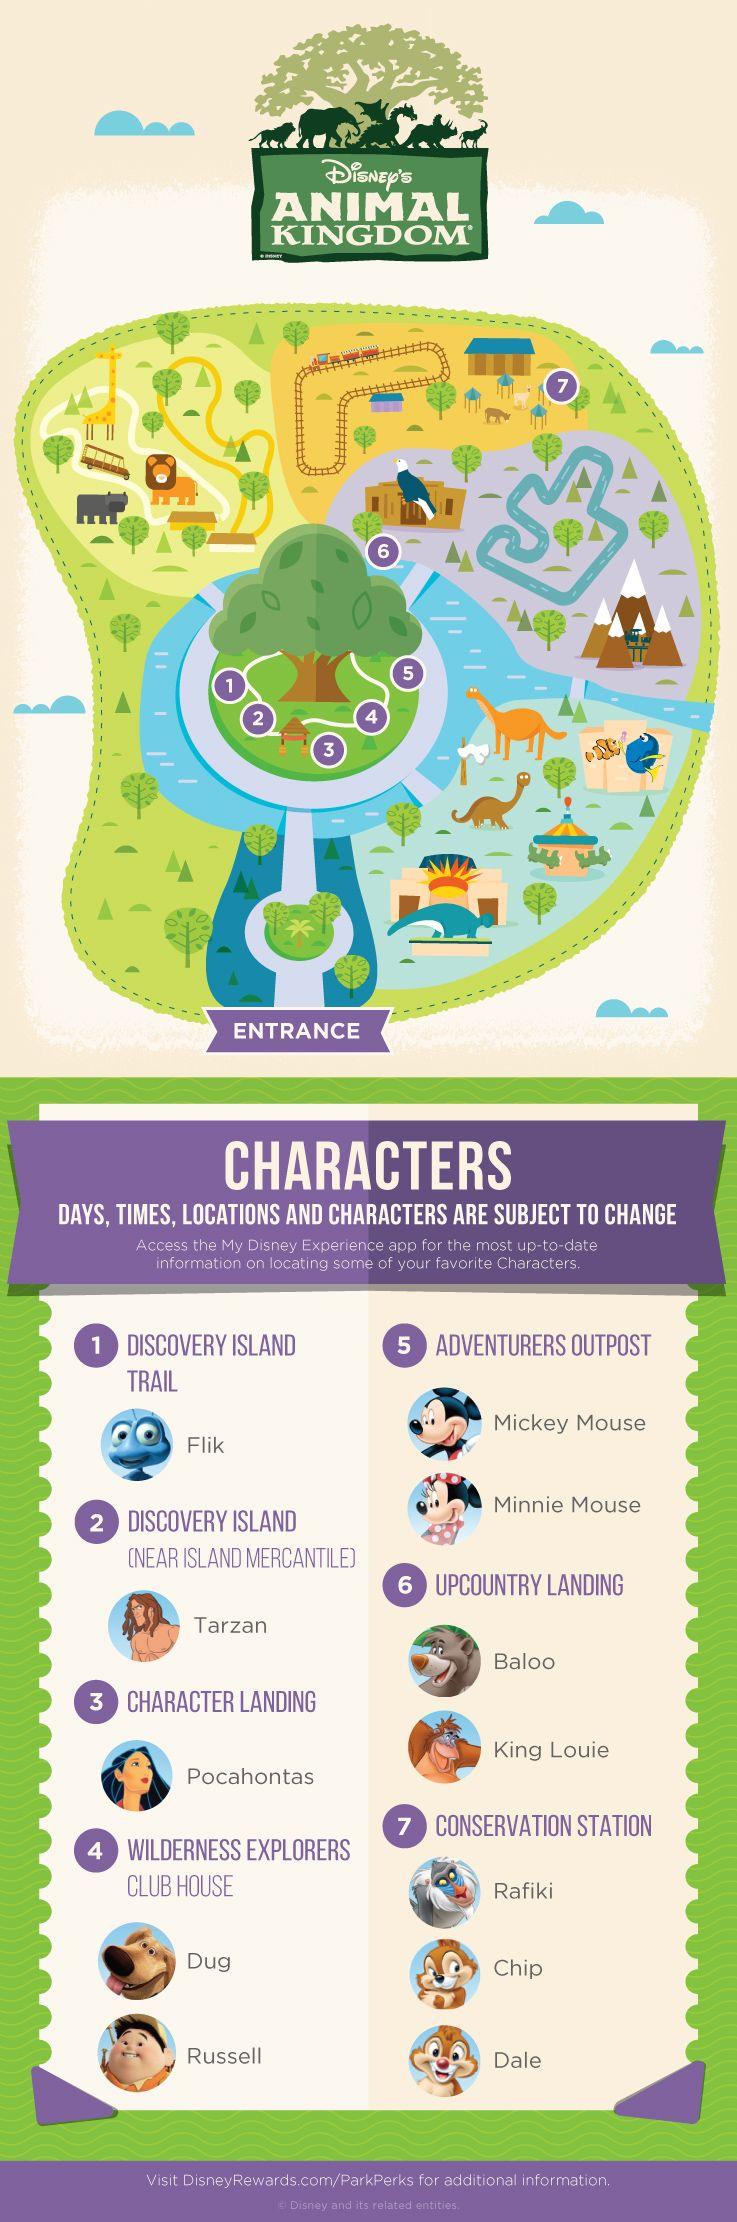 Animal Kingdom Florida Map.Disney S Animal Kingdom Character Experience Guide Disneyworld